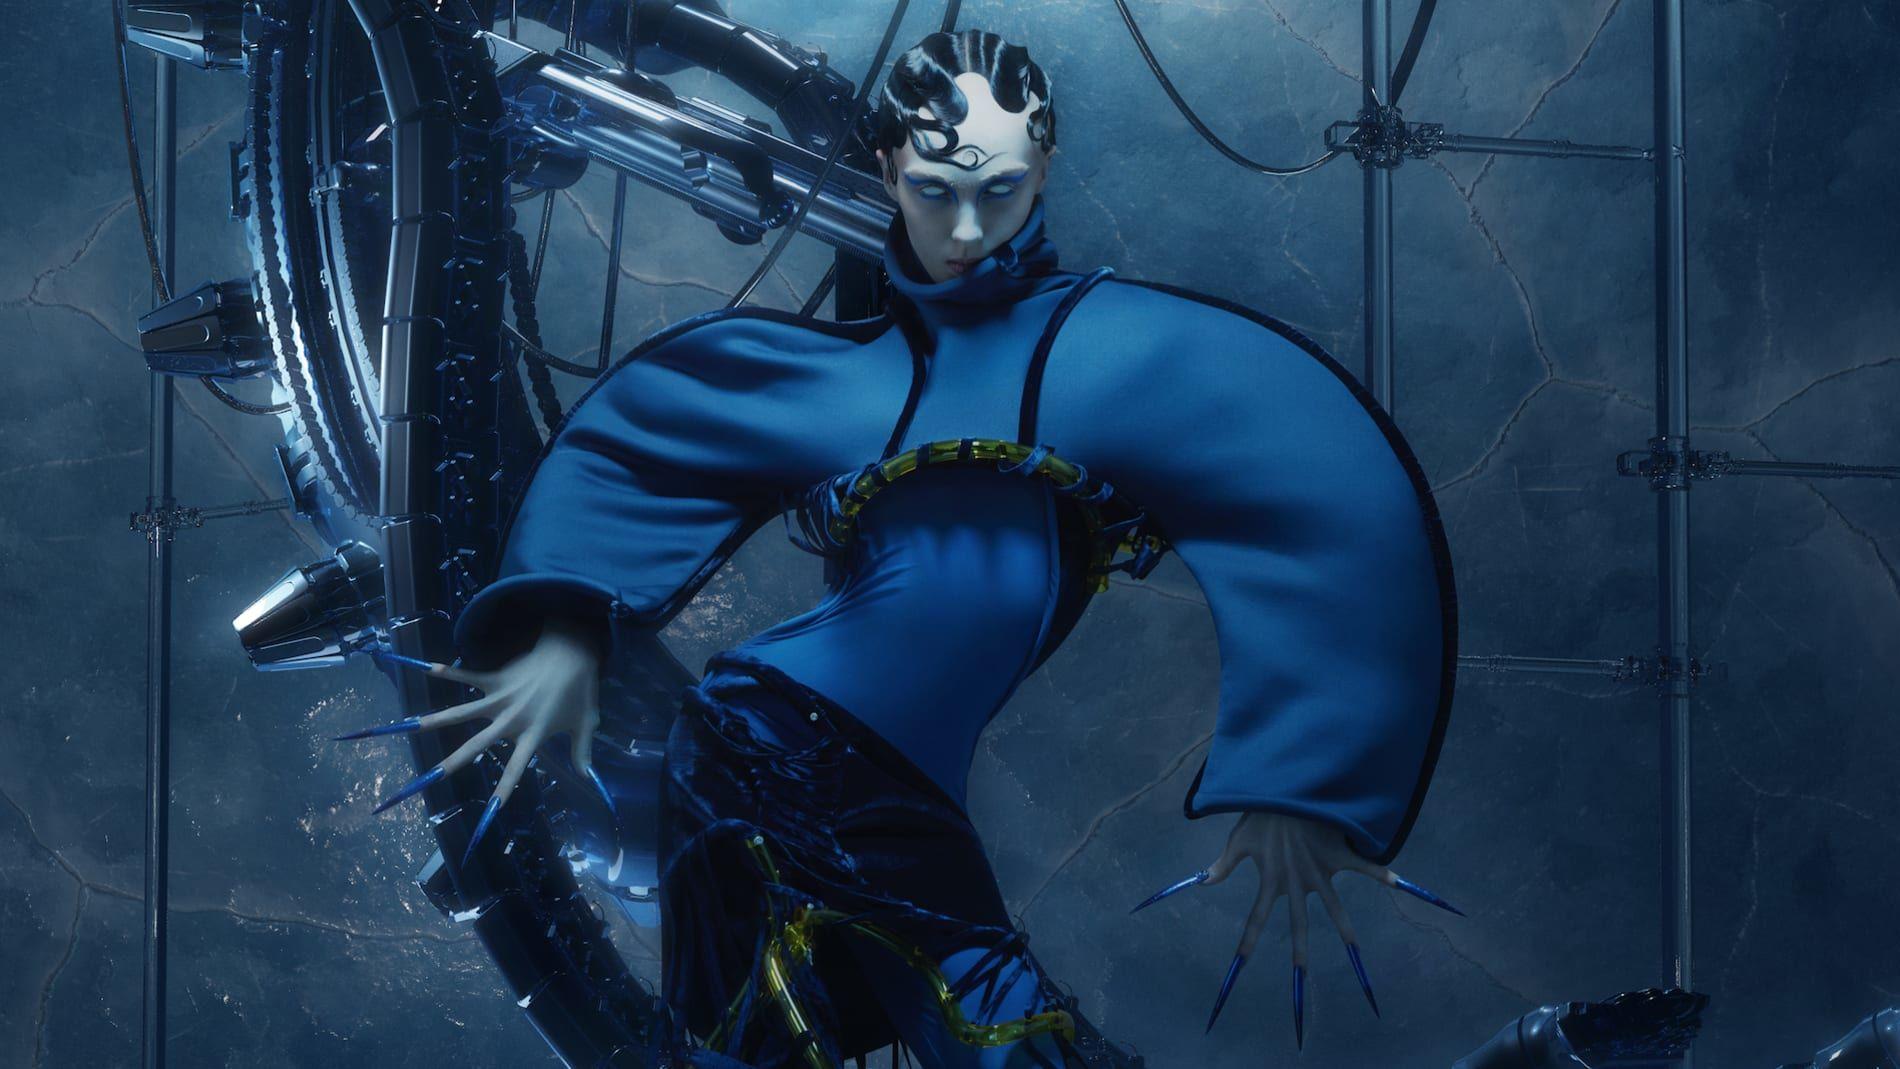 Figure wearing blue garment in robotic lanscape